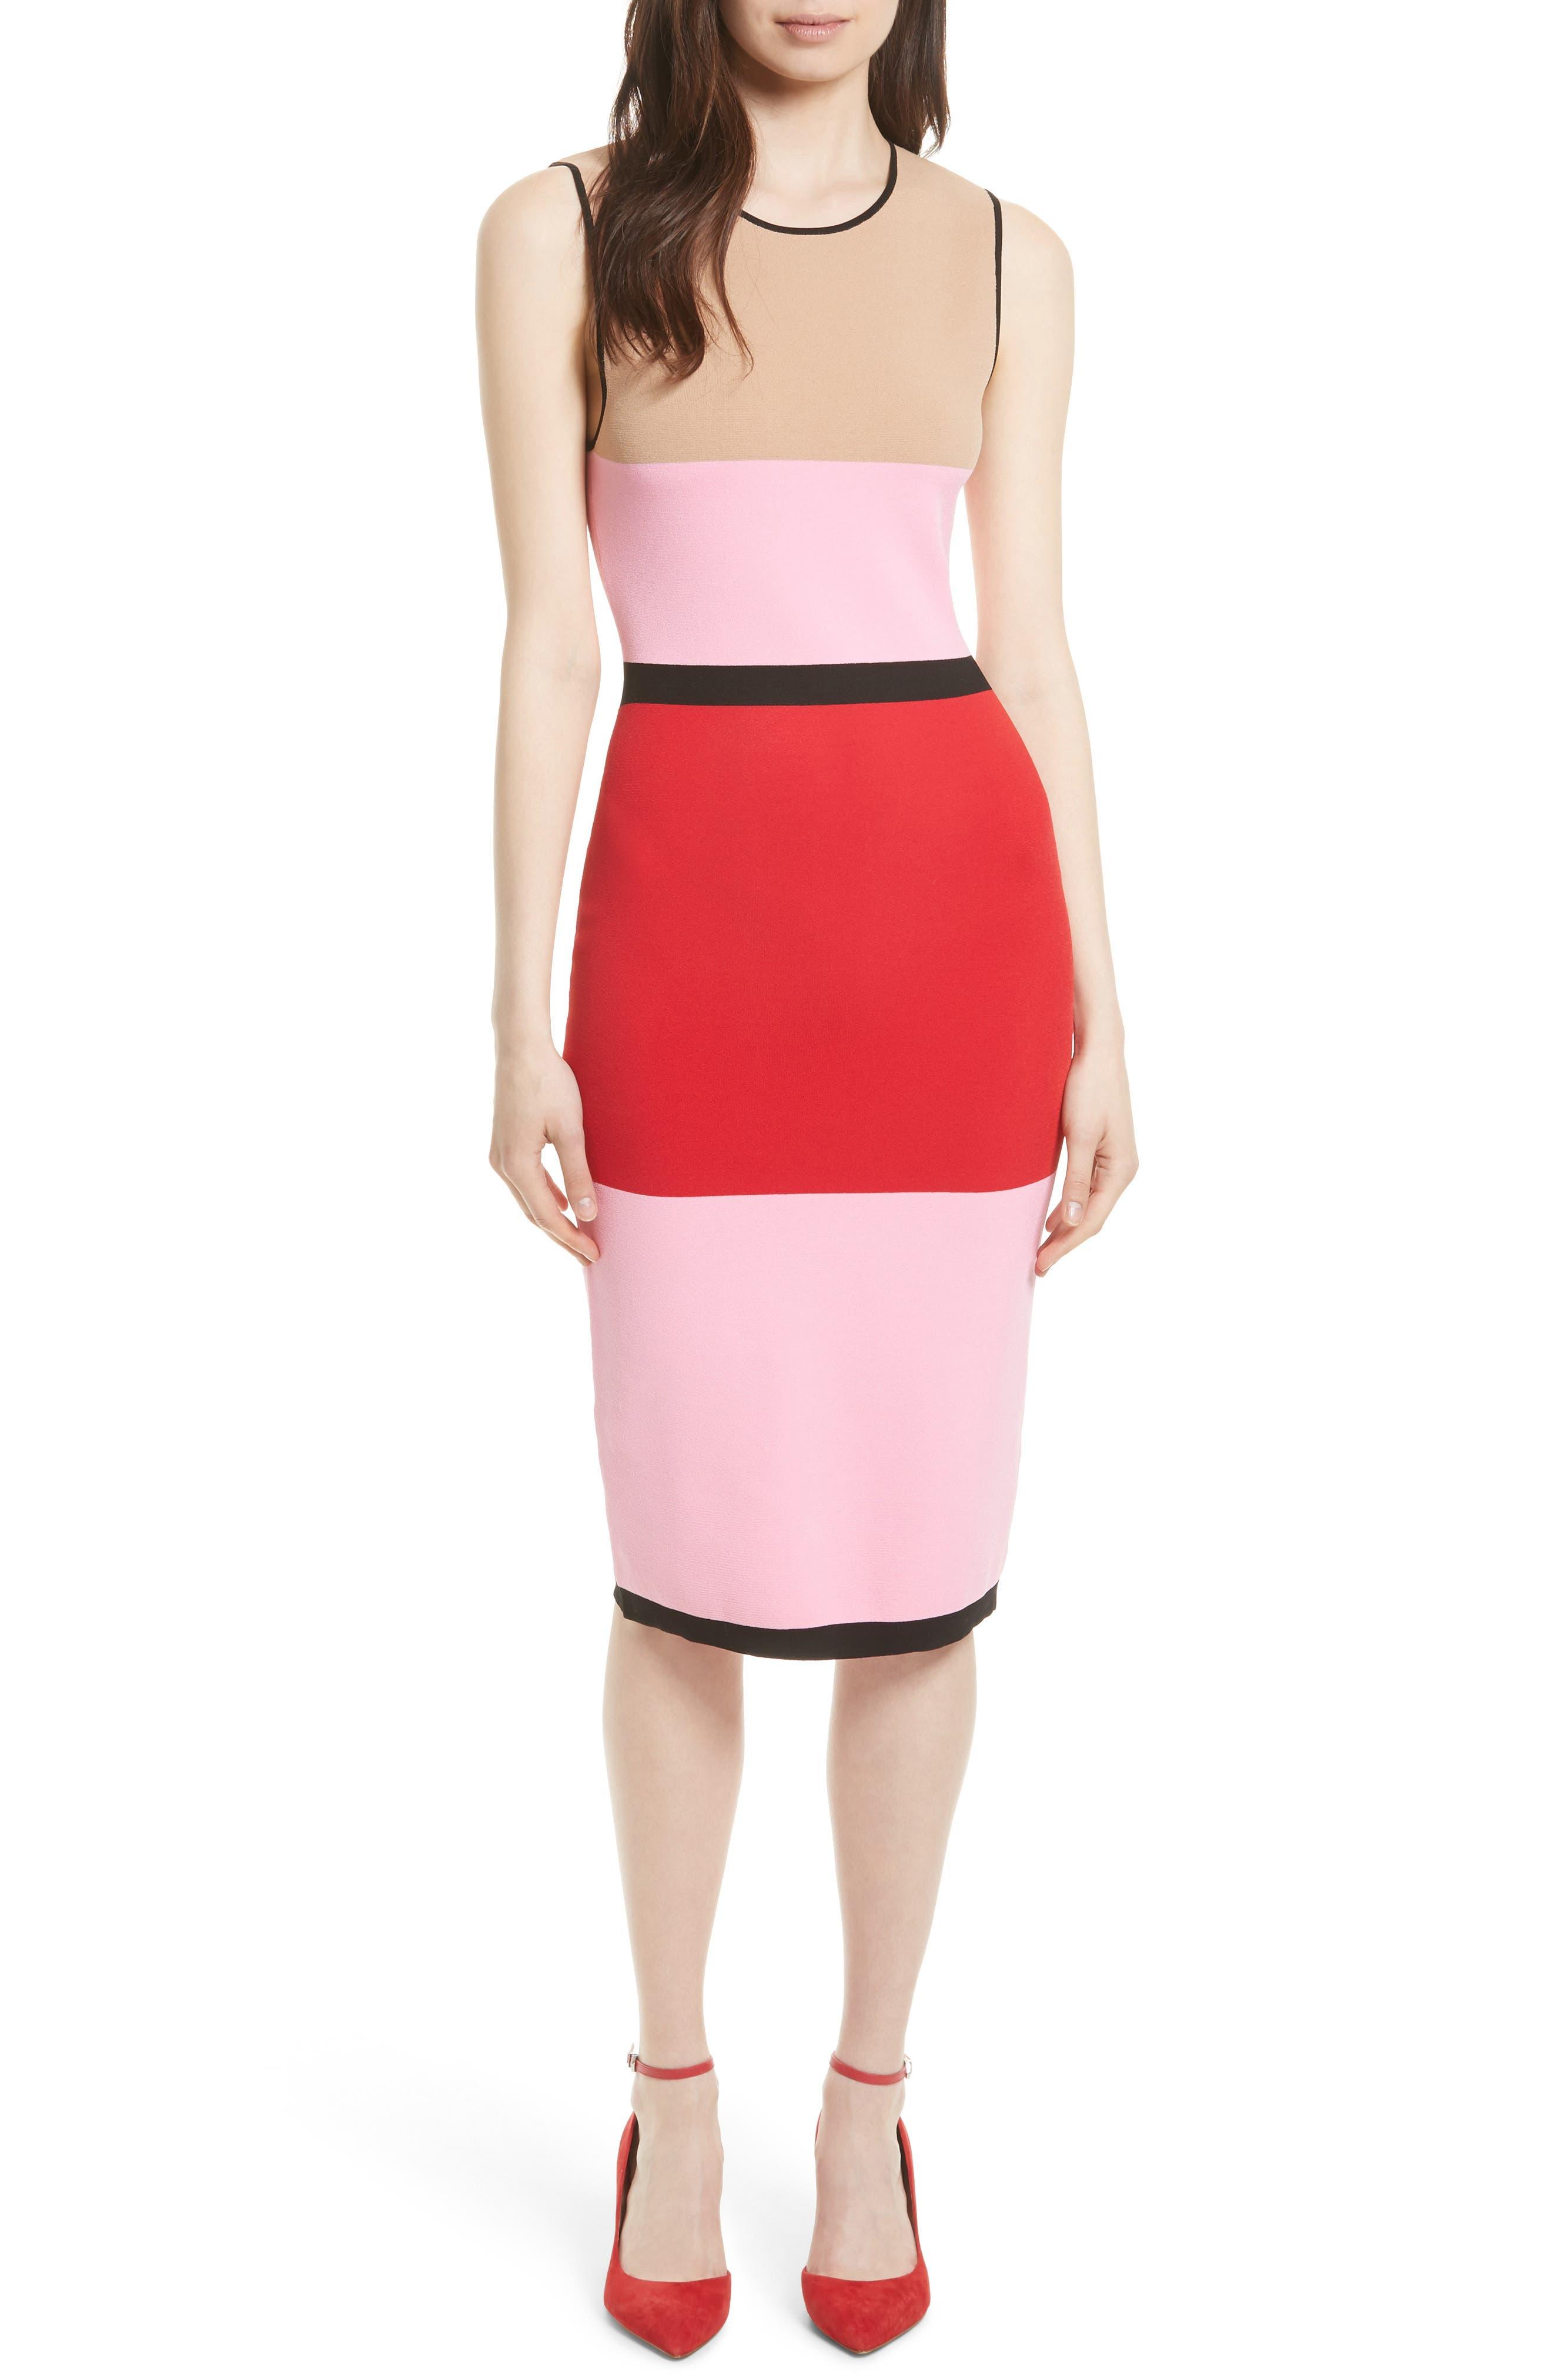 Alternate Image 1 Selected - Diane von Furstenberg Colorblock Knit Dress